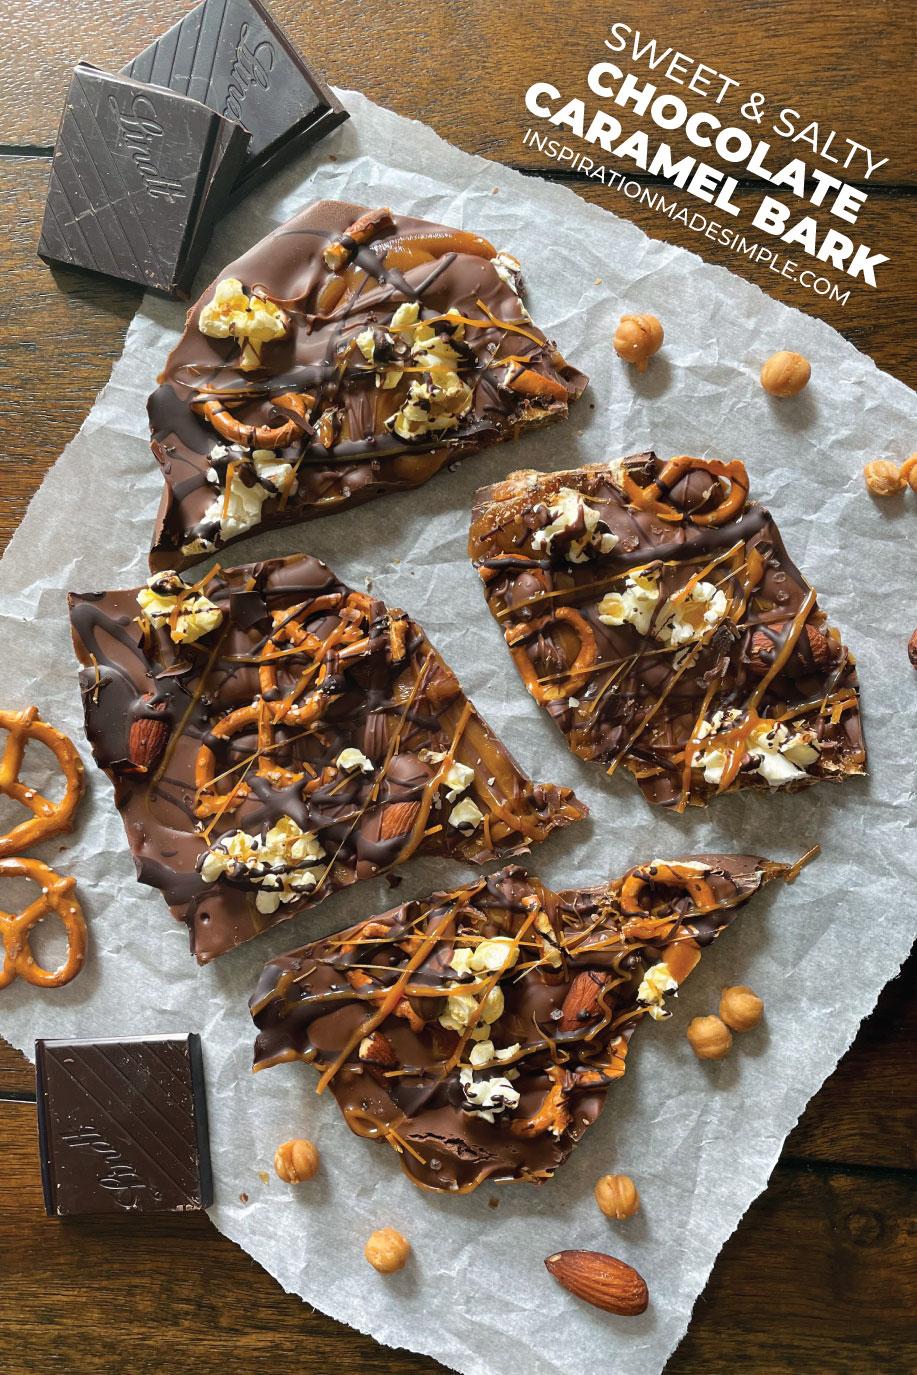 Making homemade chocolate caramel bark